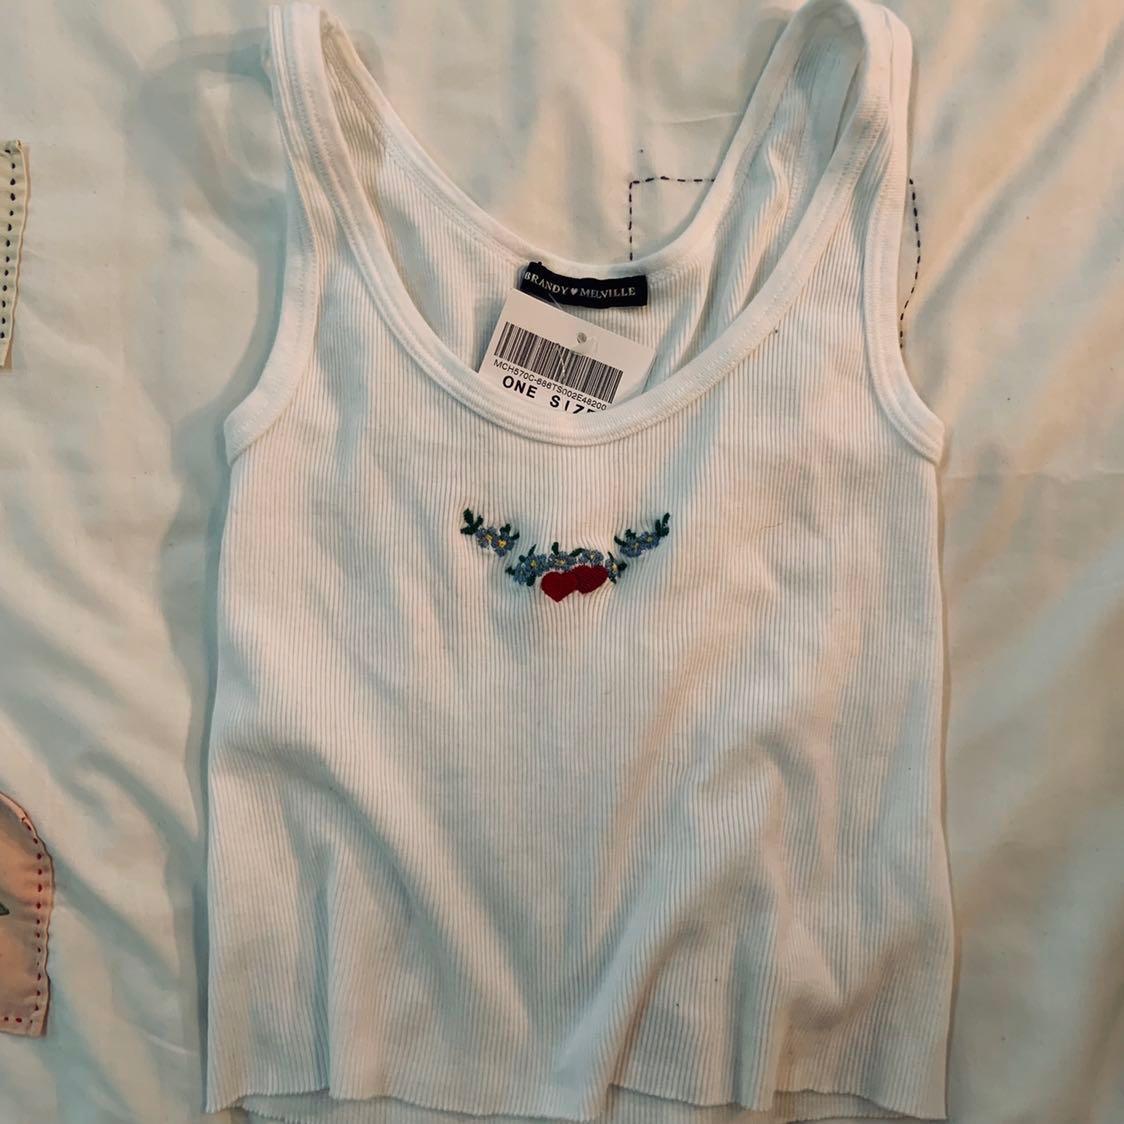 988b8a2de872bd Bnwt Brandy Melville embroided floral hearts Sheena Tank TOP ...